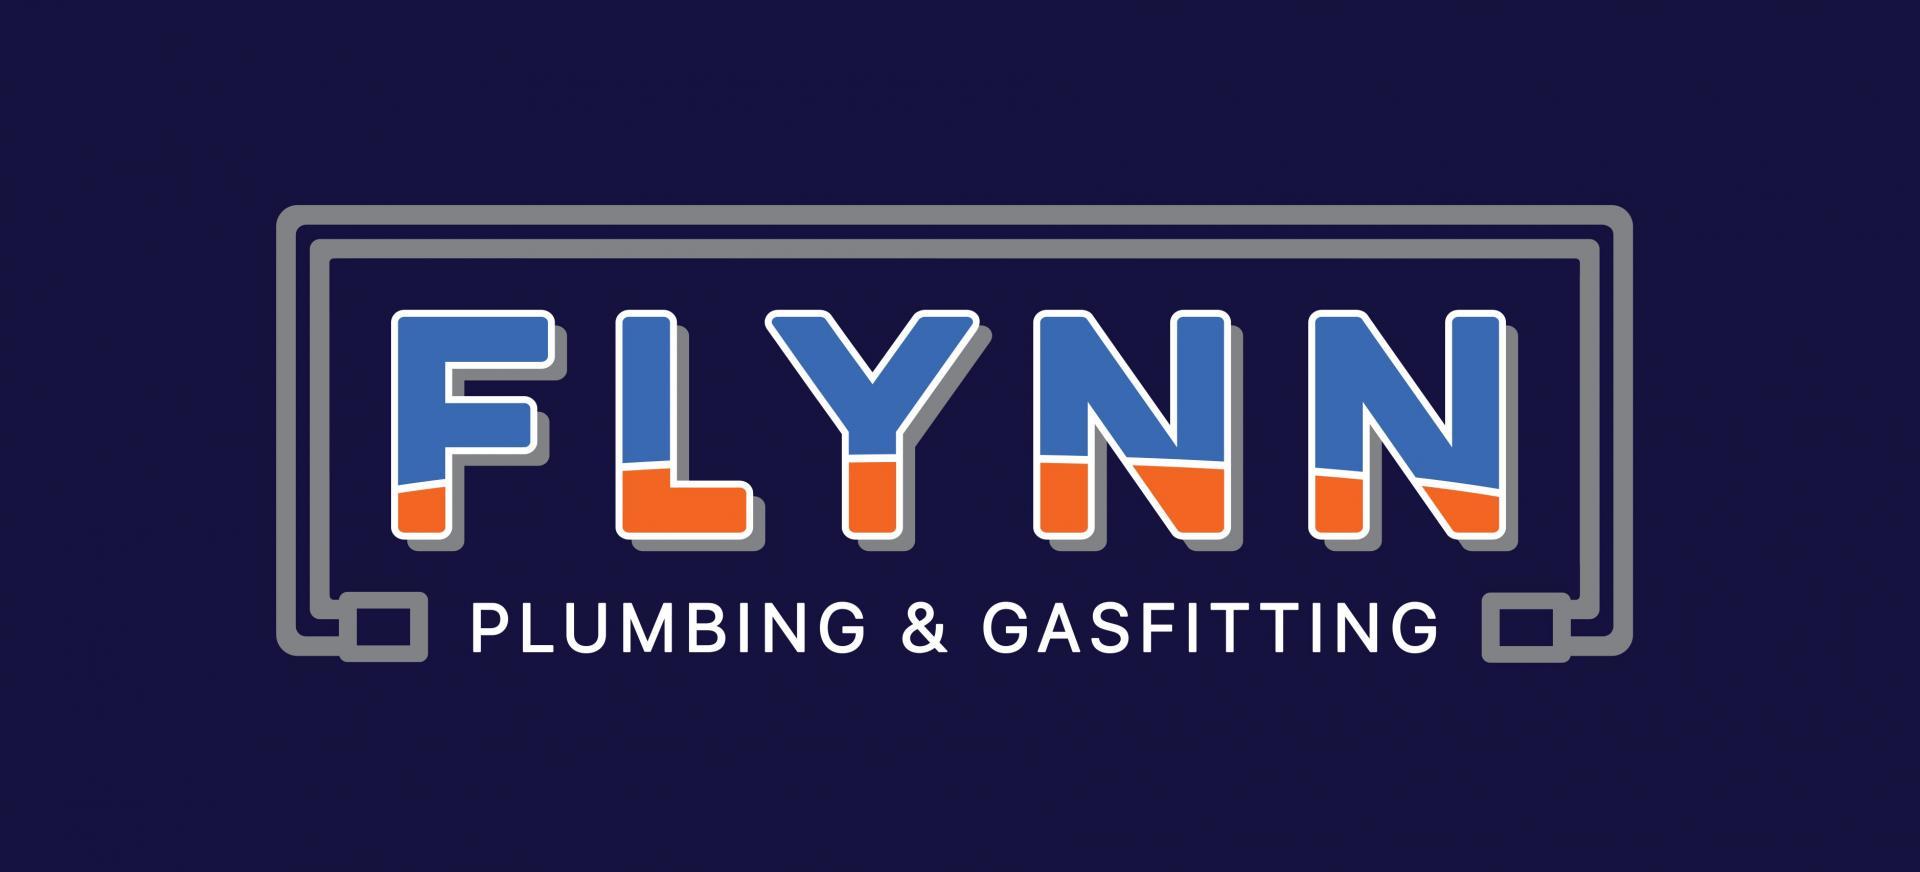 Flynn Plumbing and Gasfitting Logo